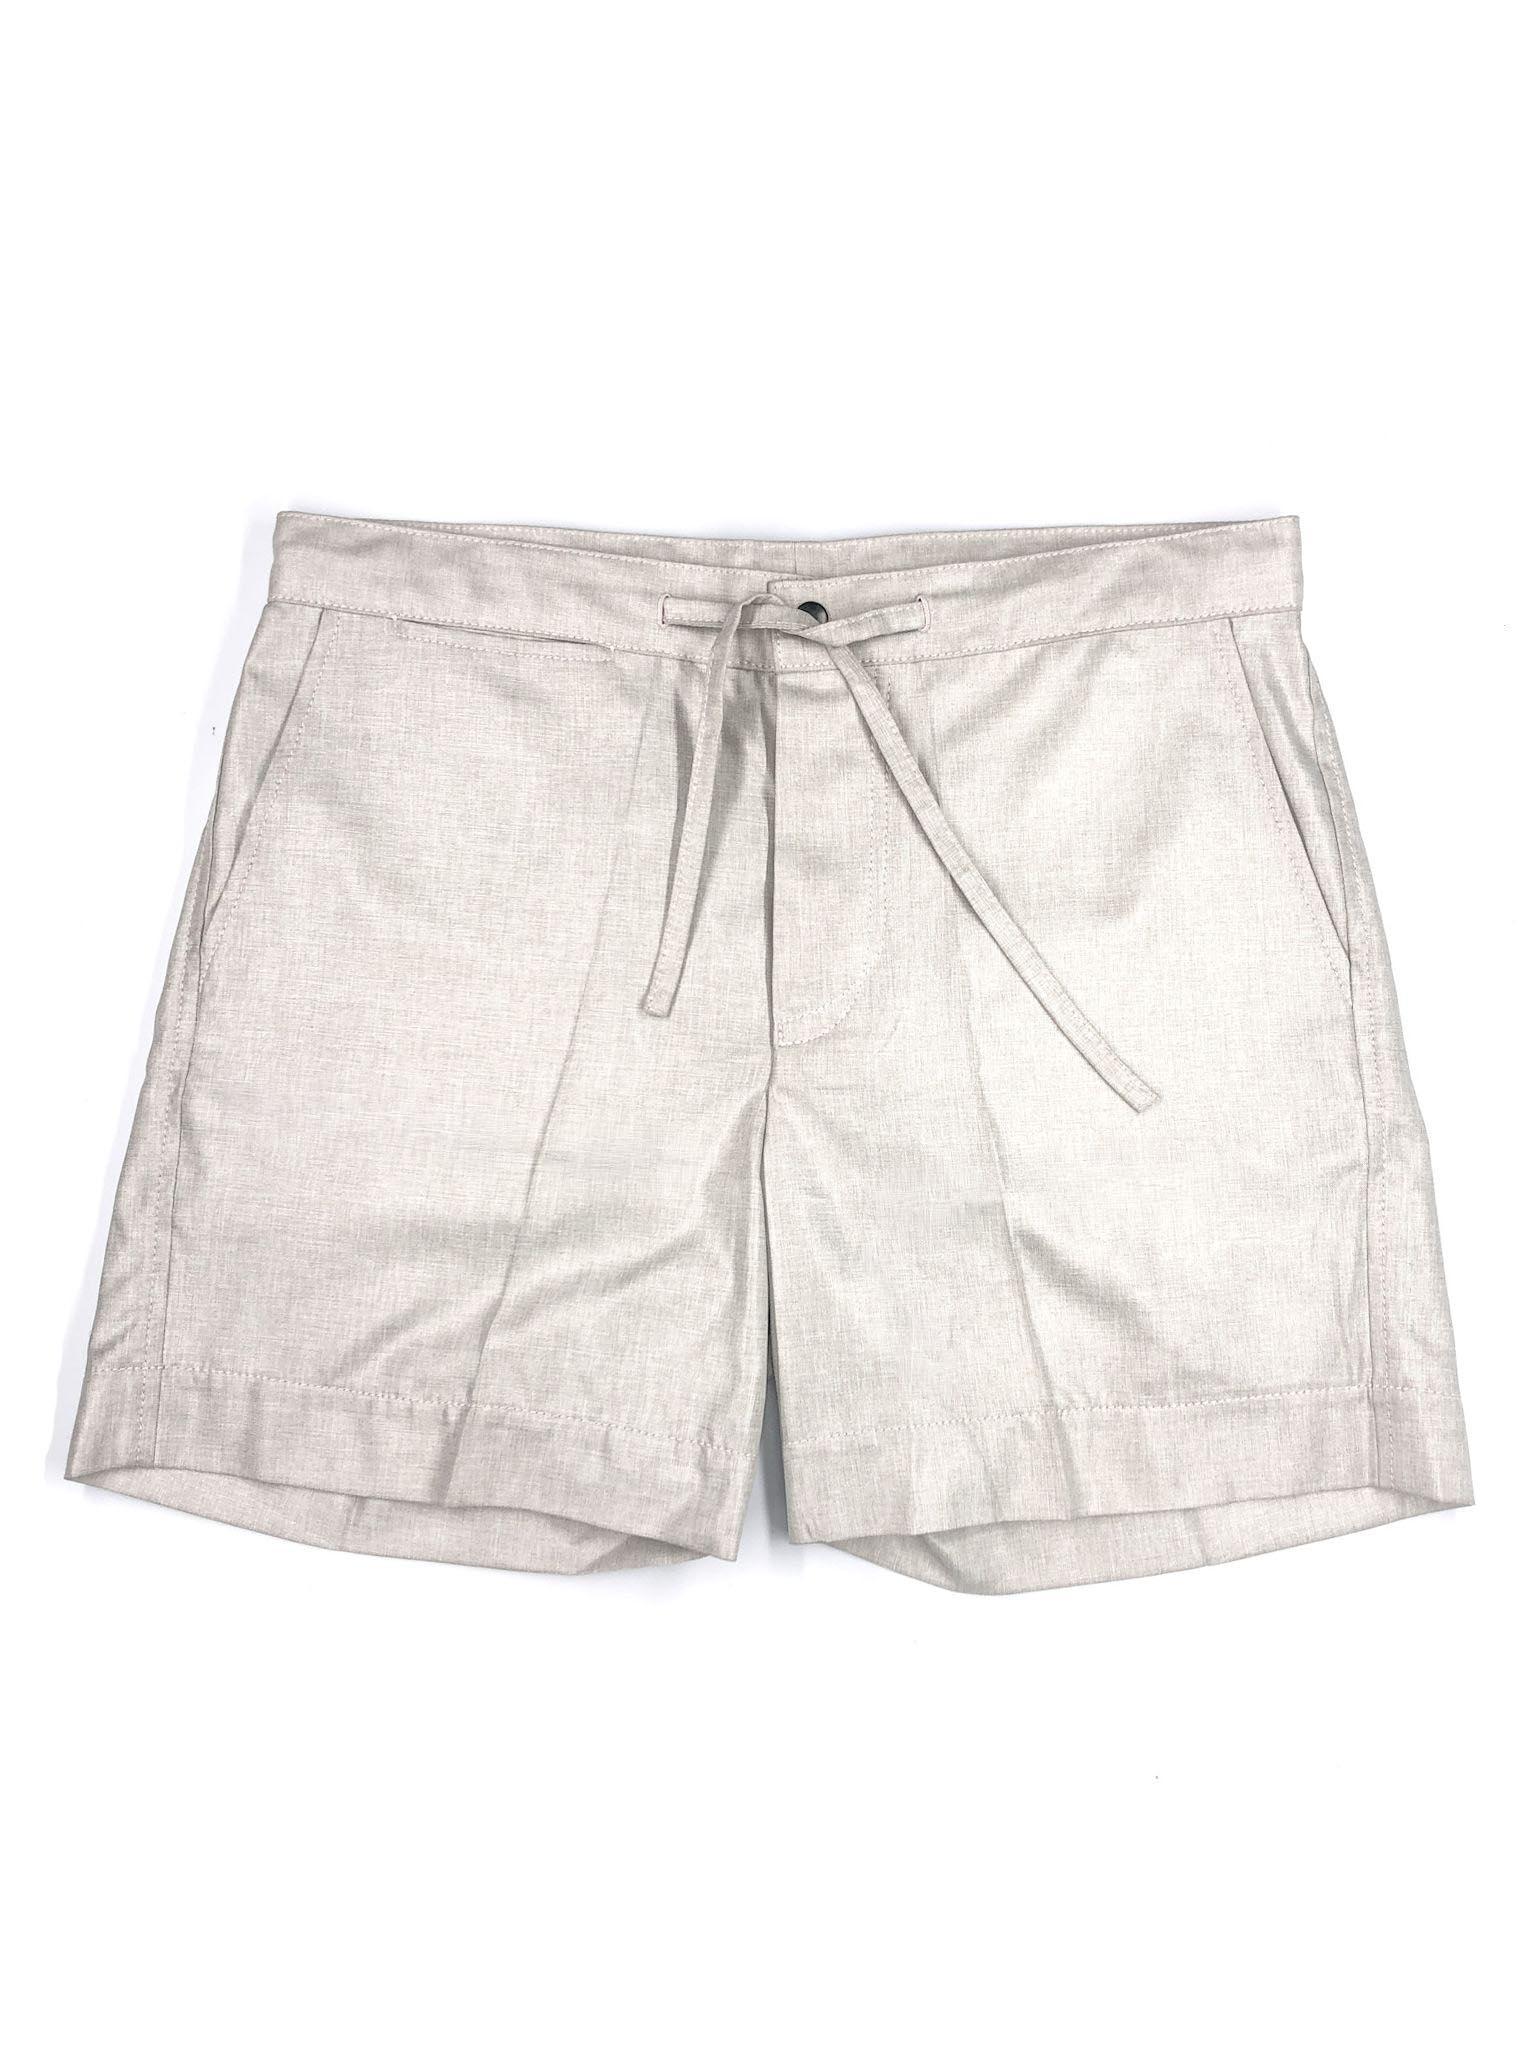 Powder Drawstring Shorts